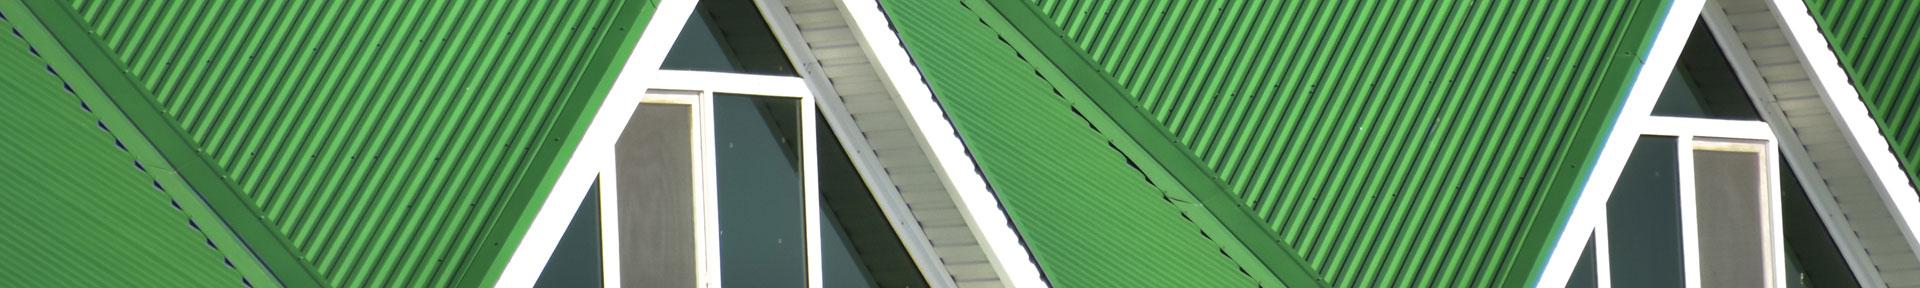 Locations Progressive Roofing